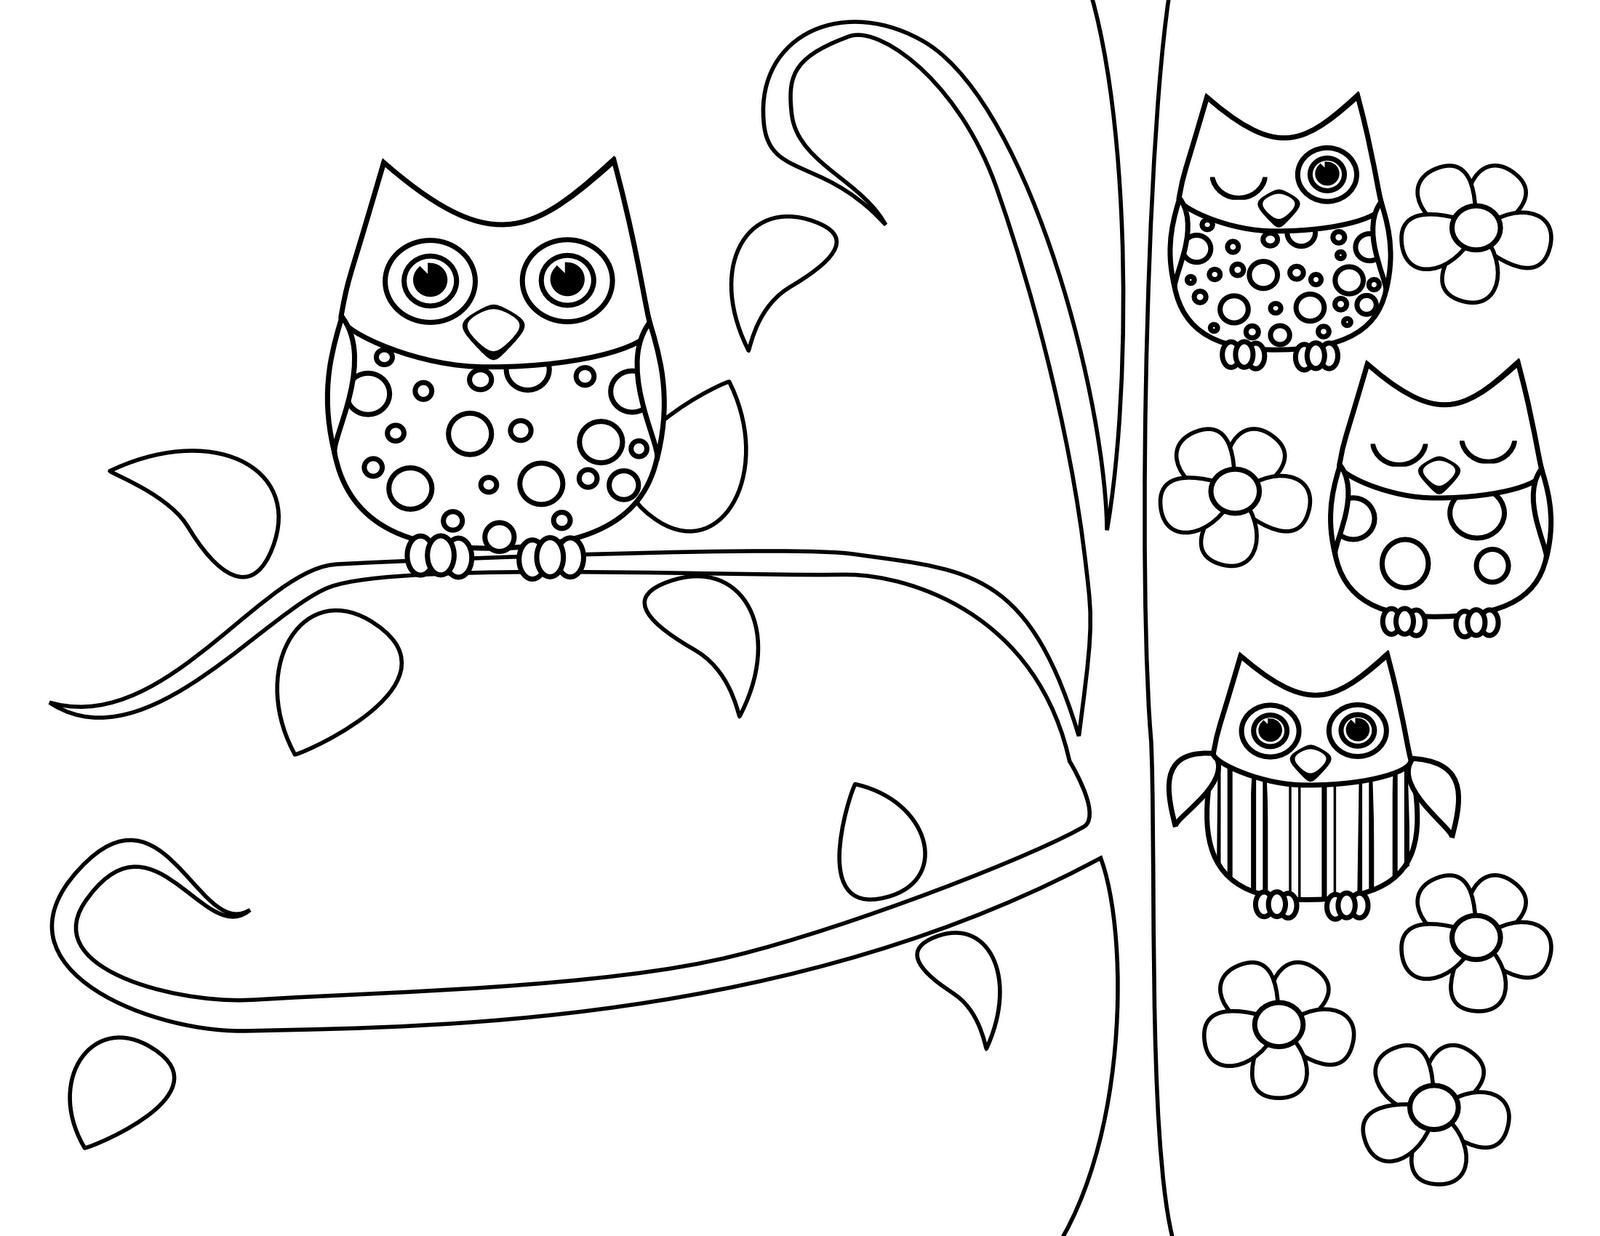 1600x1236 Baby Owls Coloring Sheets Coloring Sheets